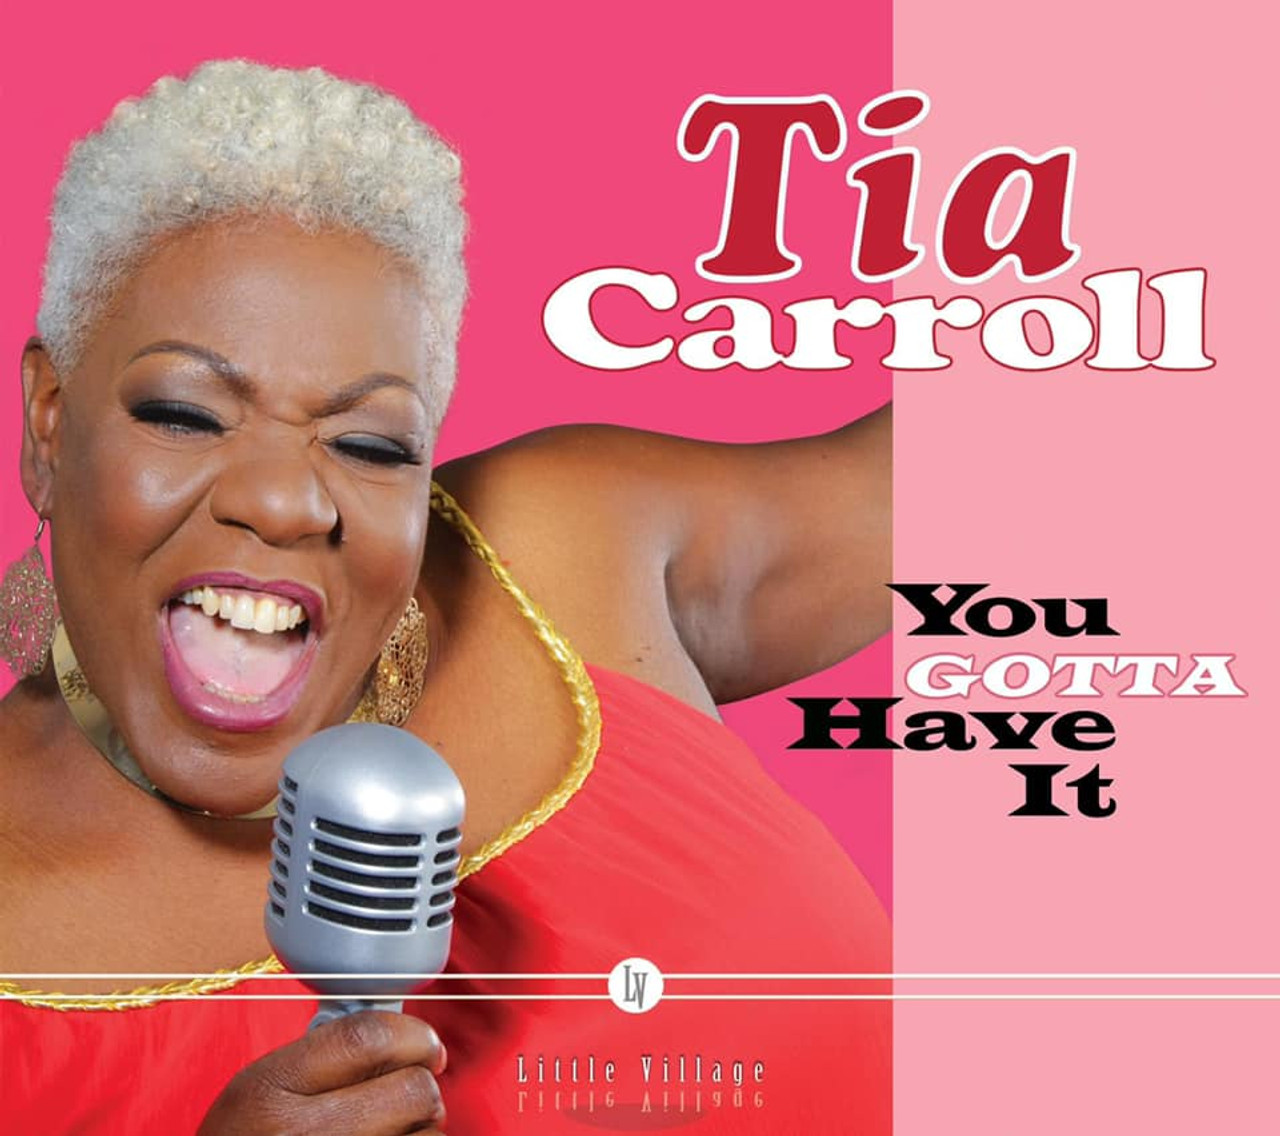 TIA CARROLL -  YOU GOTTA HAVE IT